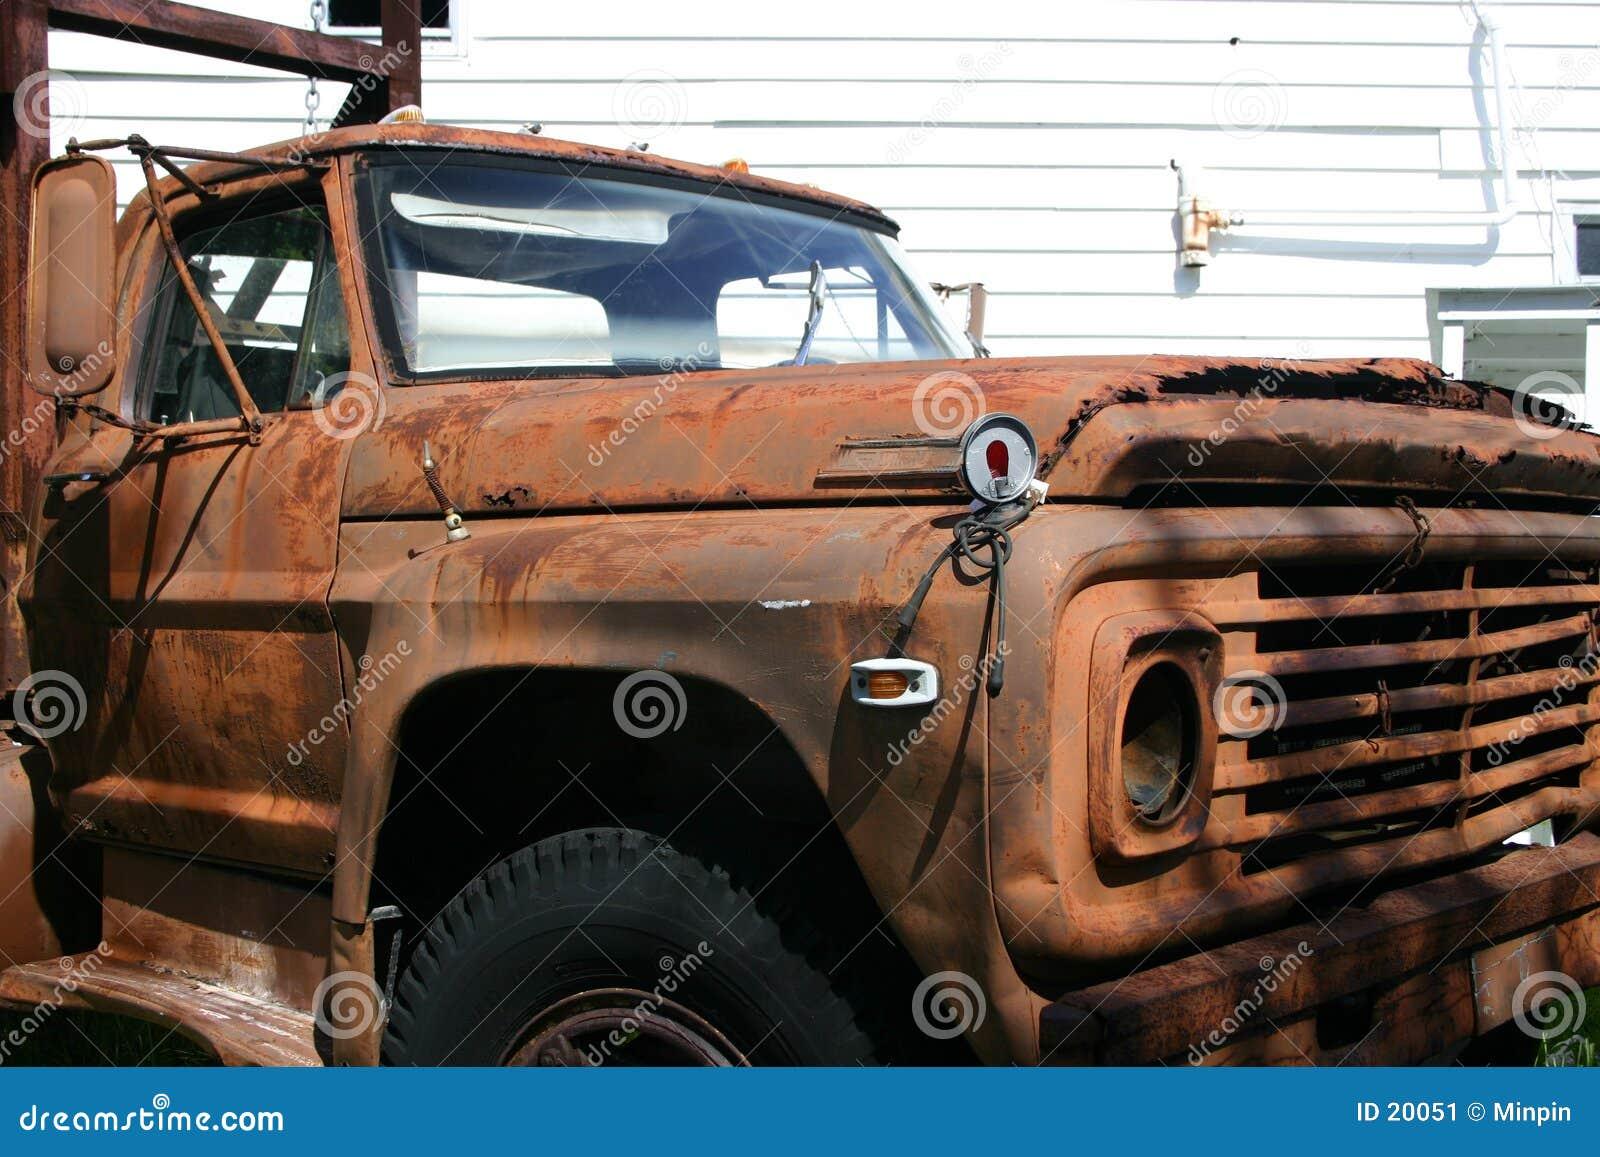 Truck2 viejo oxidado